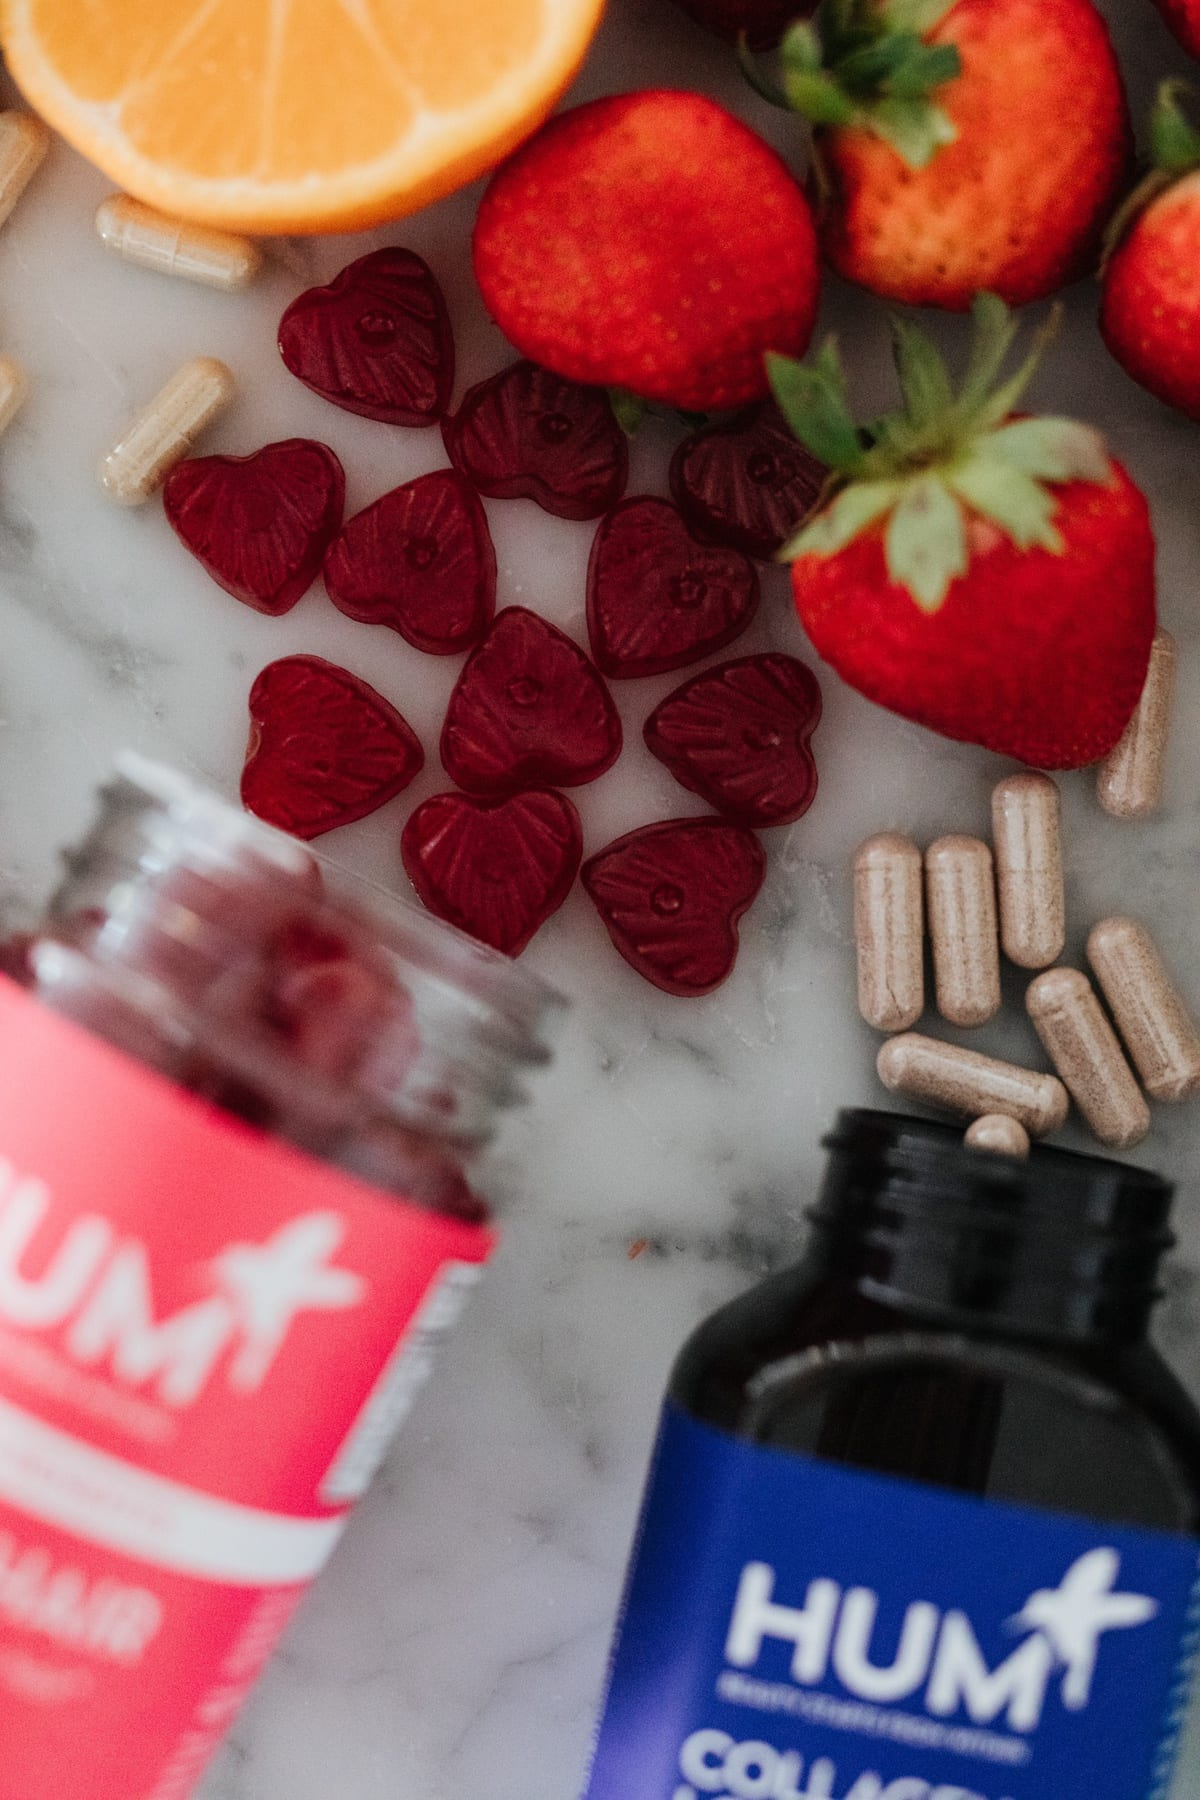 HUM nutrition hair supplements